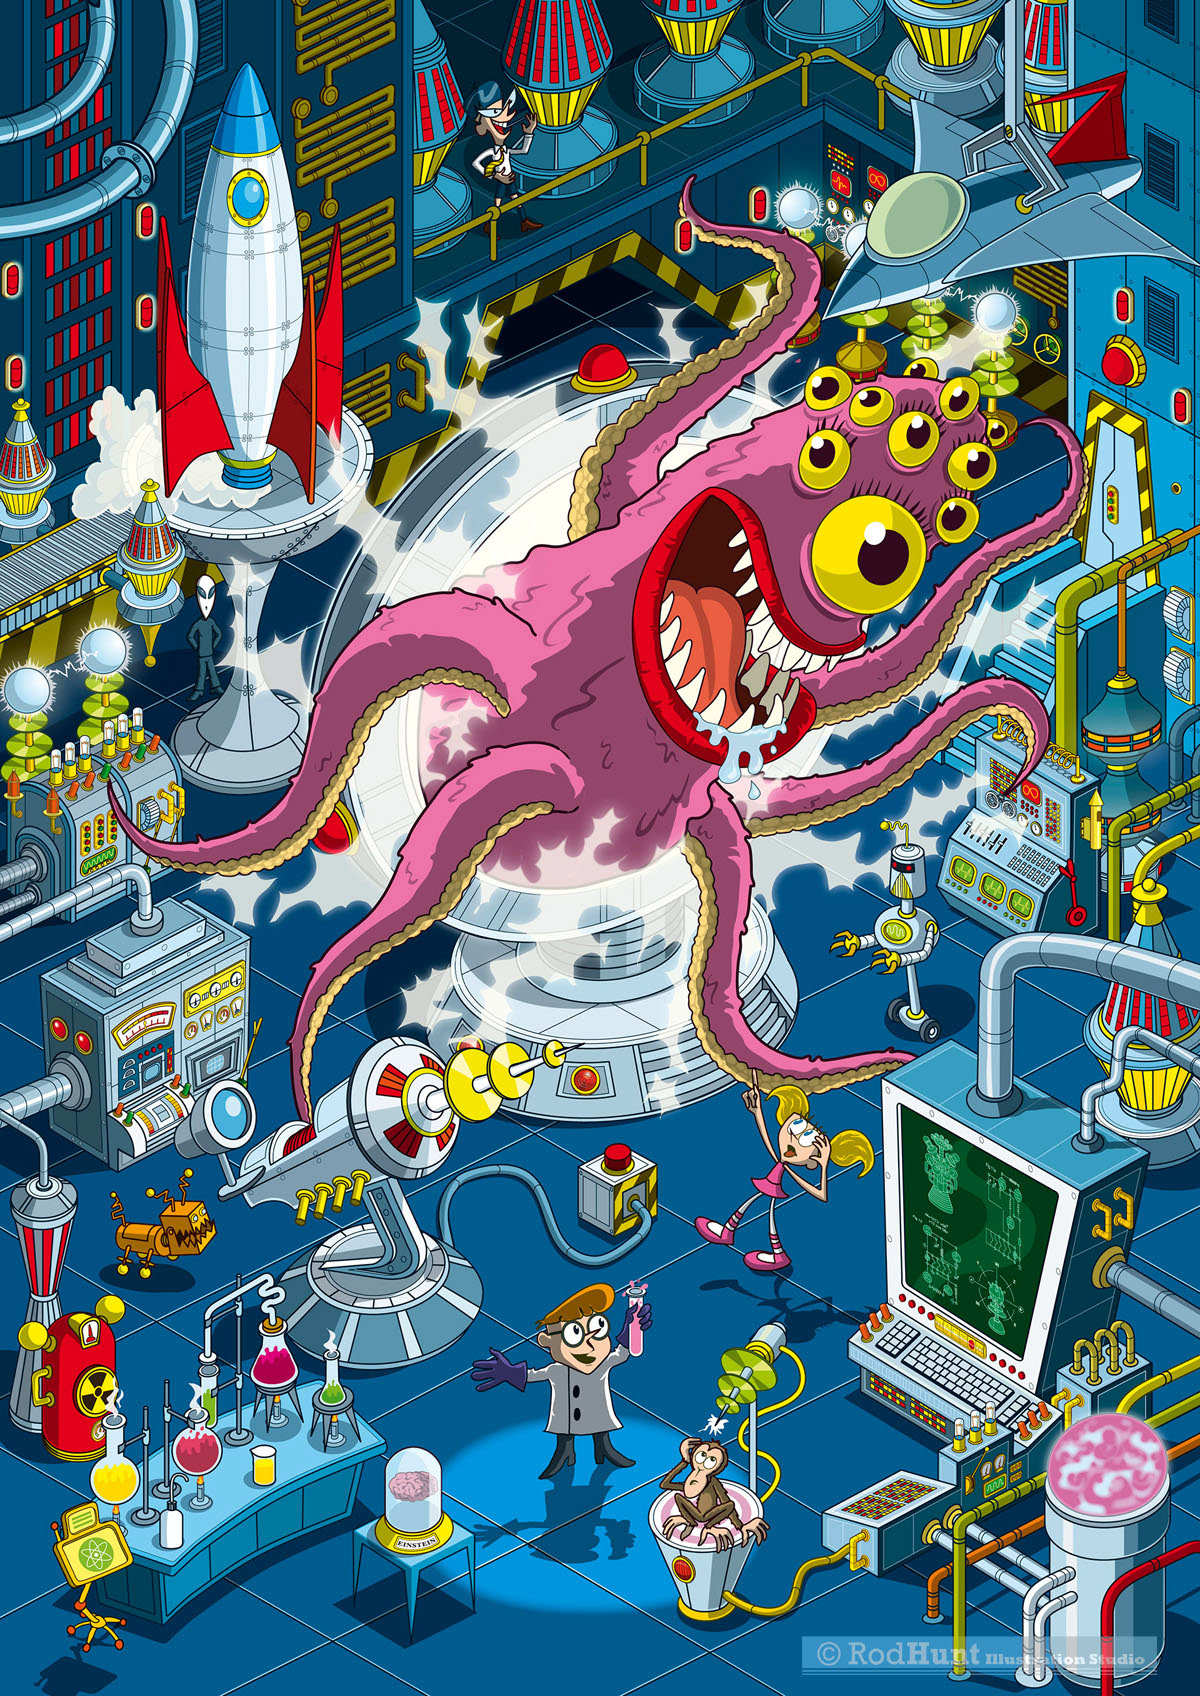 dexters laboratory full movie